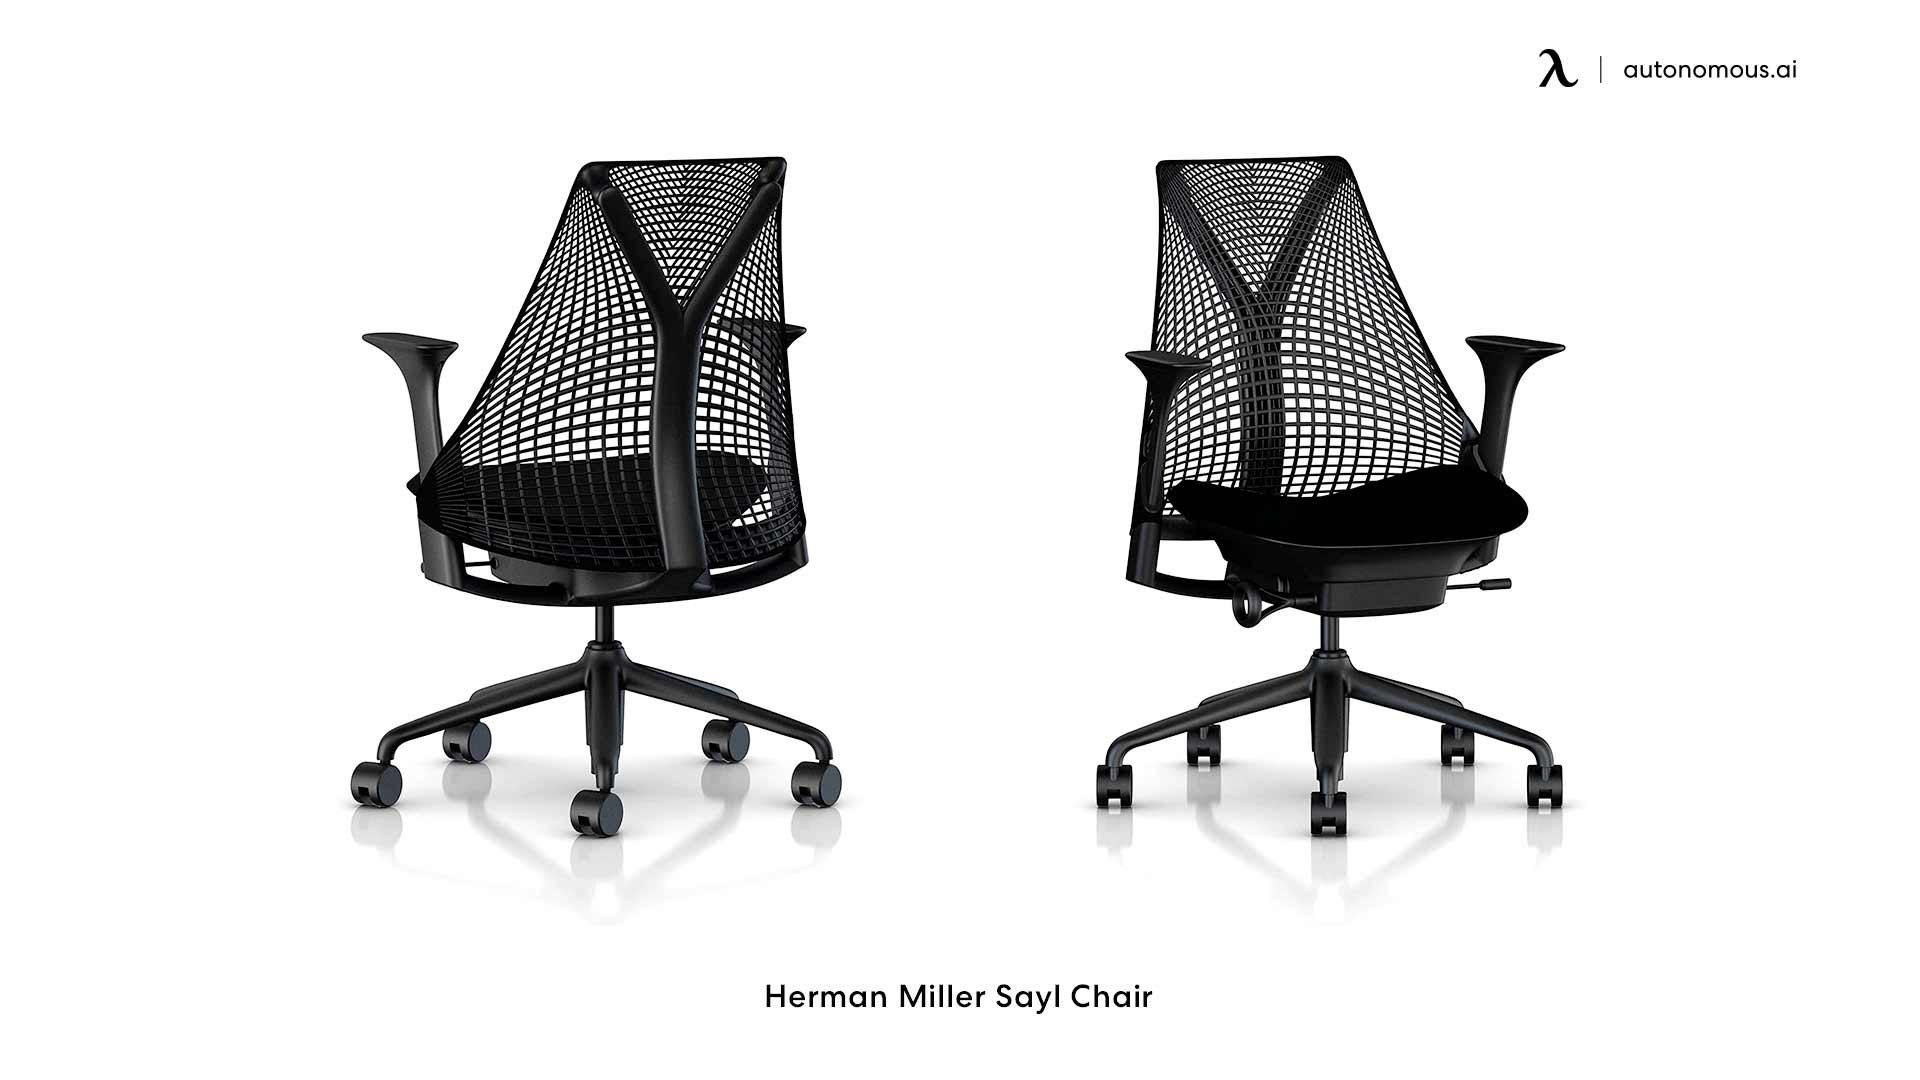 Herman Miller's Sayl Chair